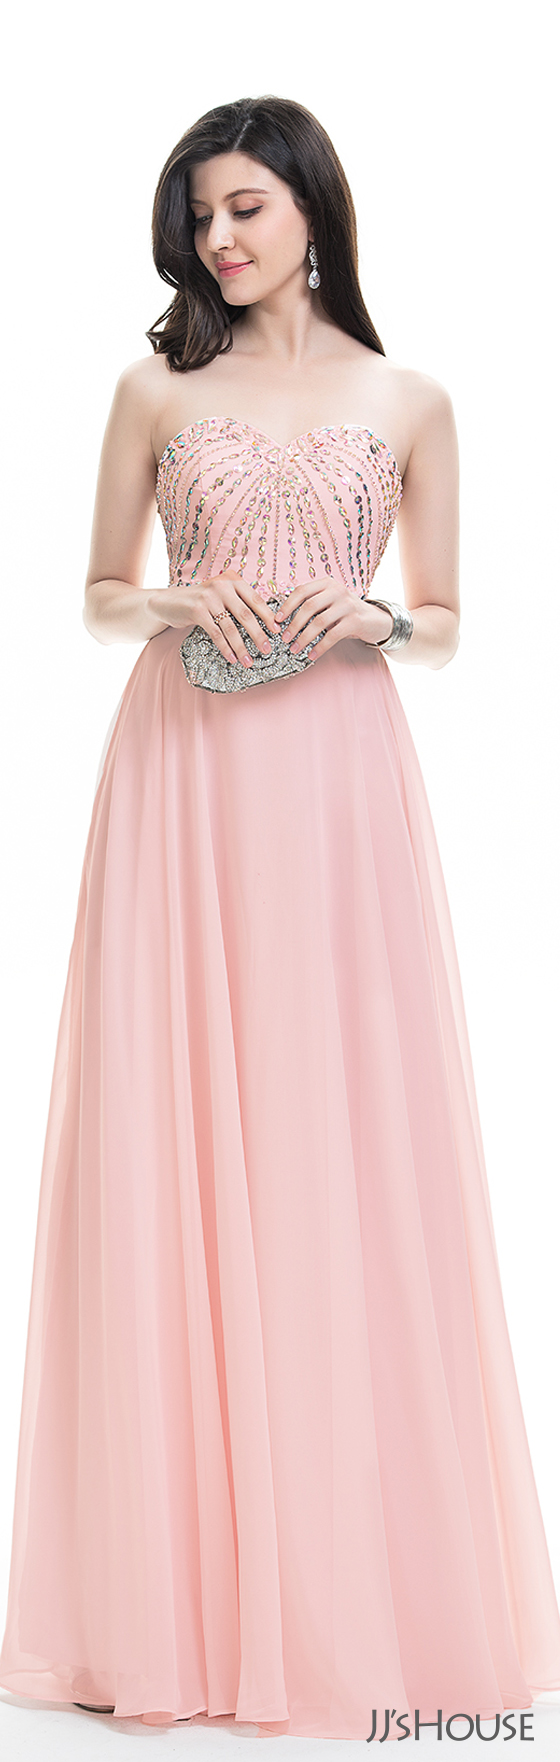 JJsHouse #Prom | Vestidos | Pinterest | Vestiditos, Vestidos de dama ...